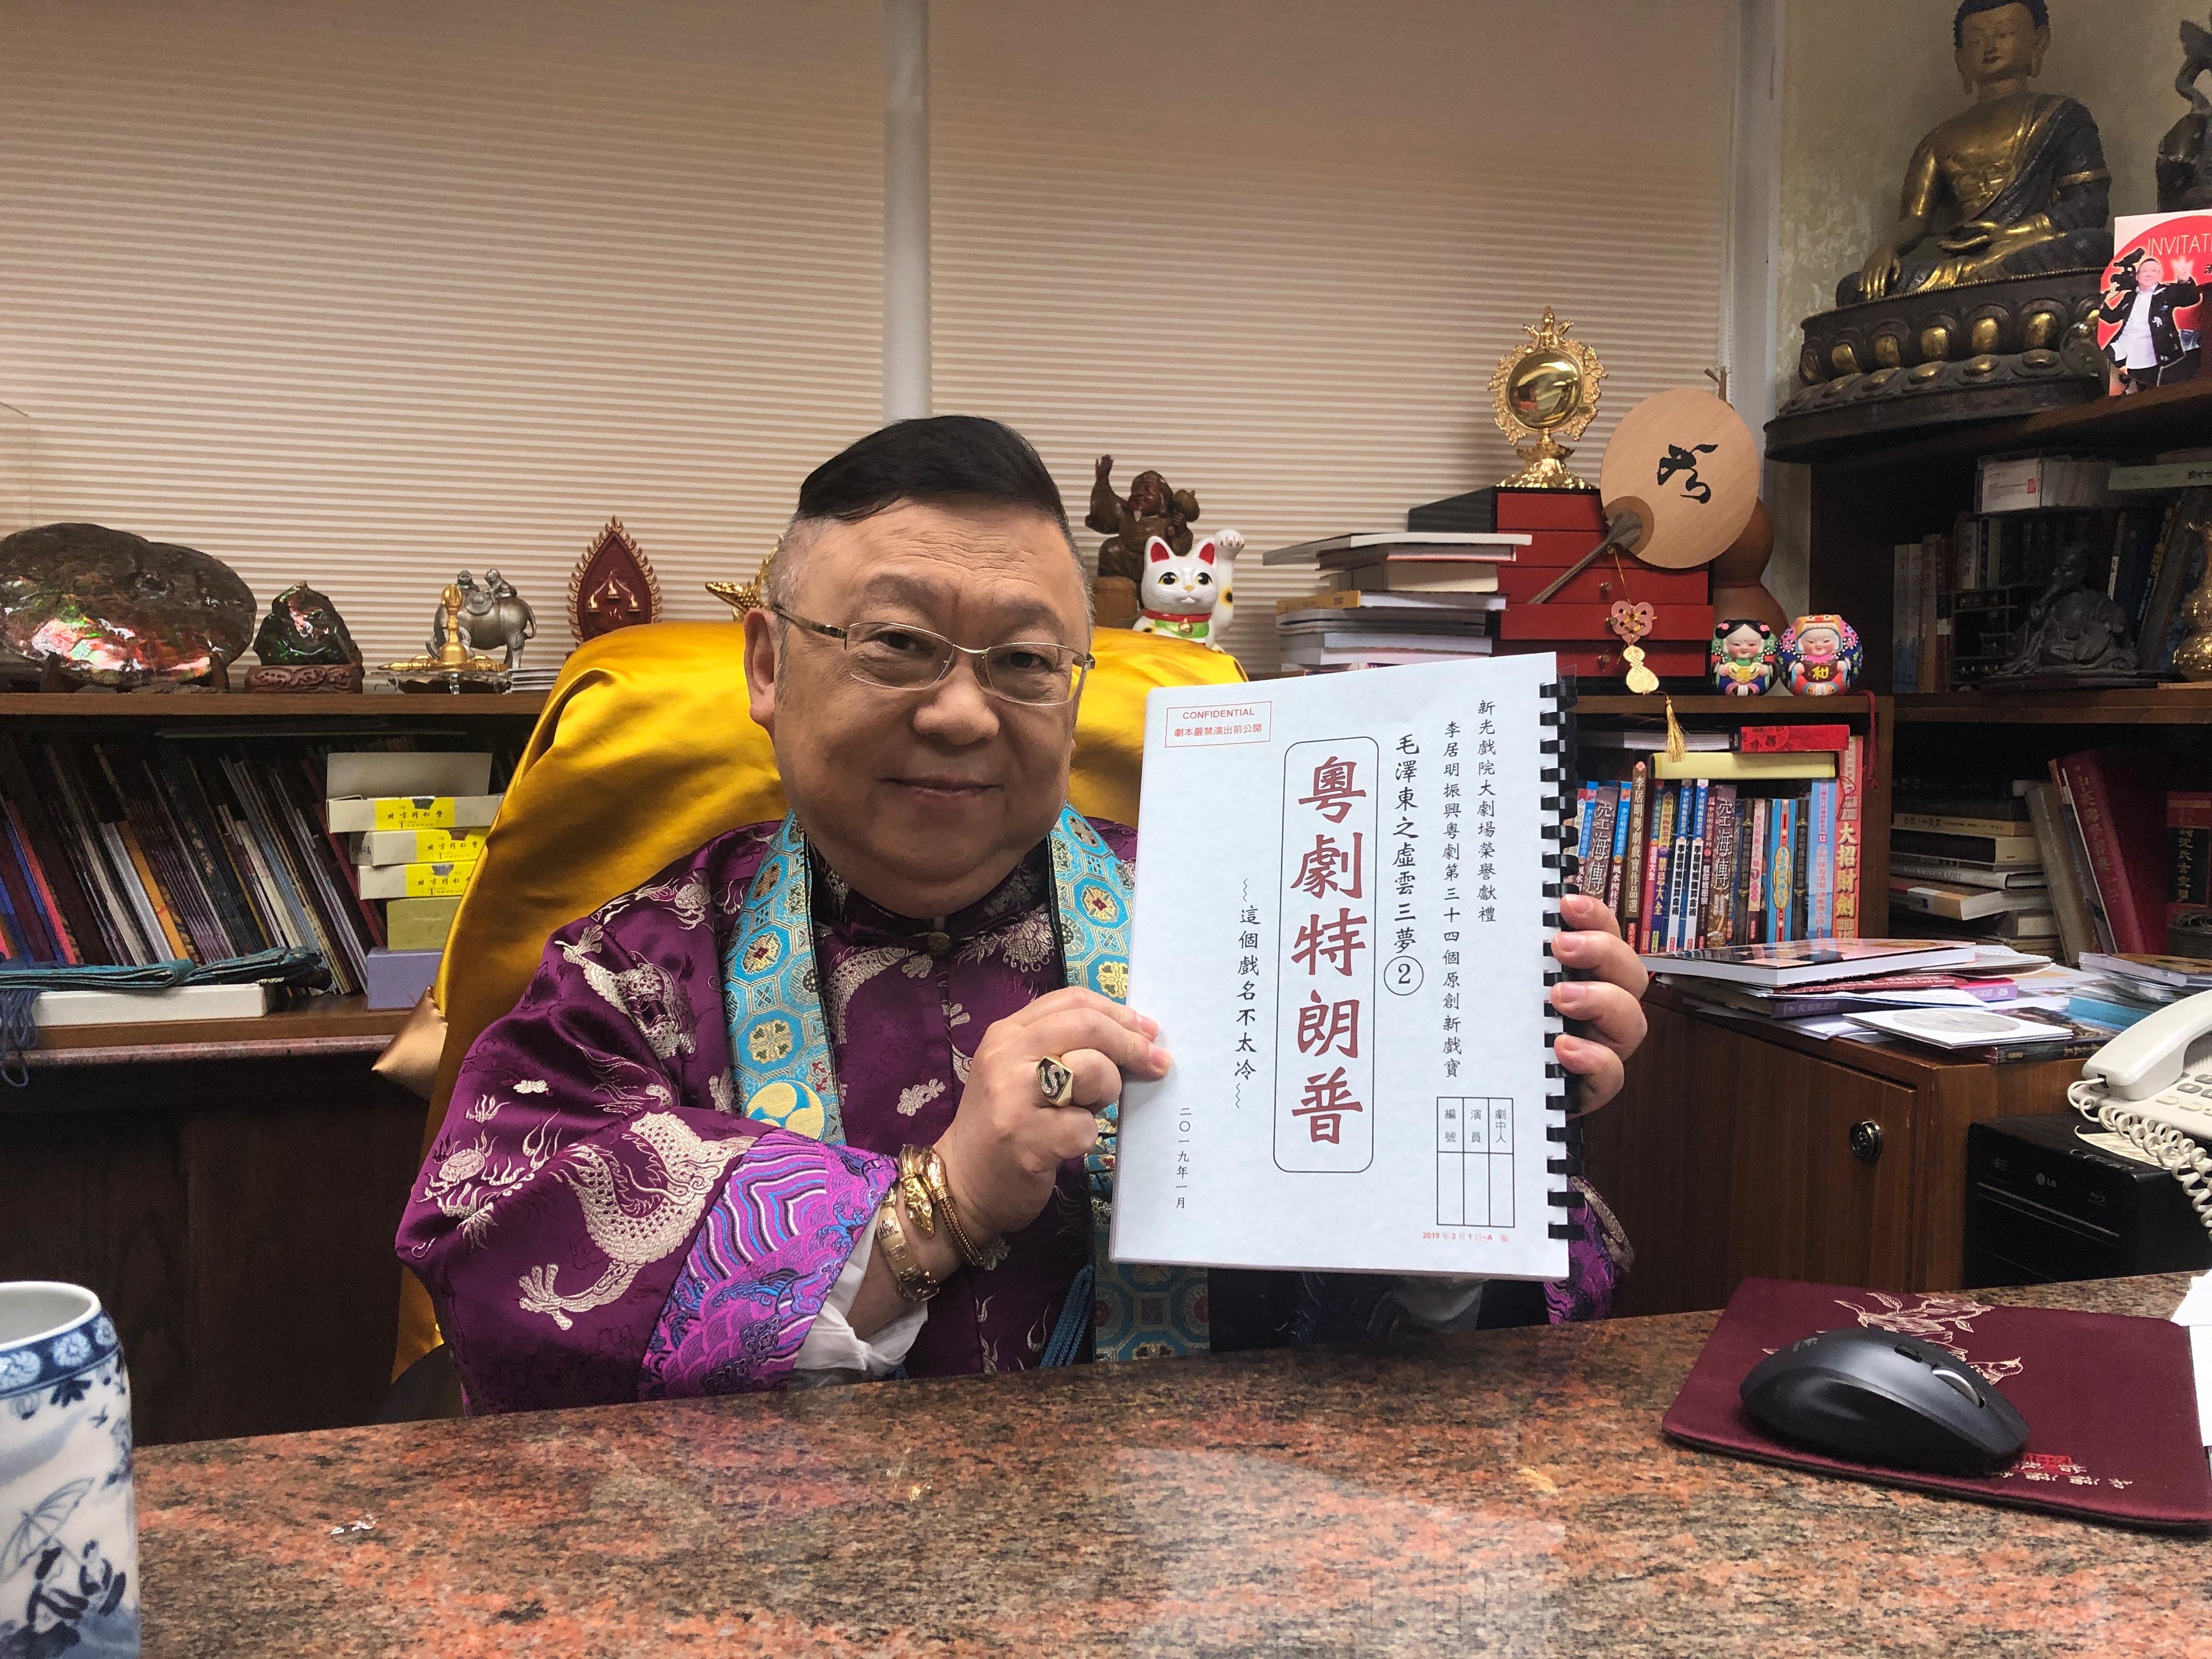 Donald Trump meets Mao in a new Cantonese opera in Hong Kong — Quartzy